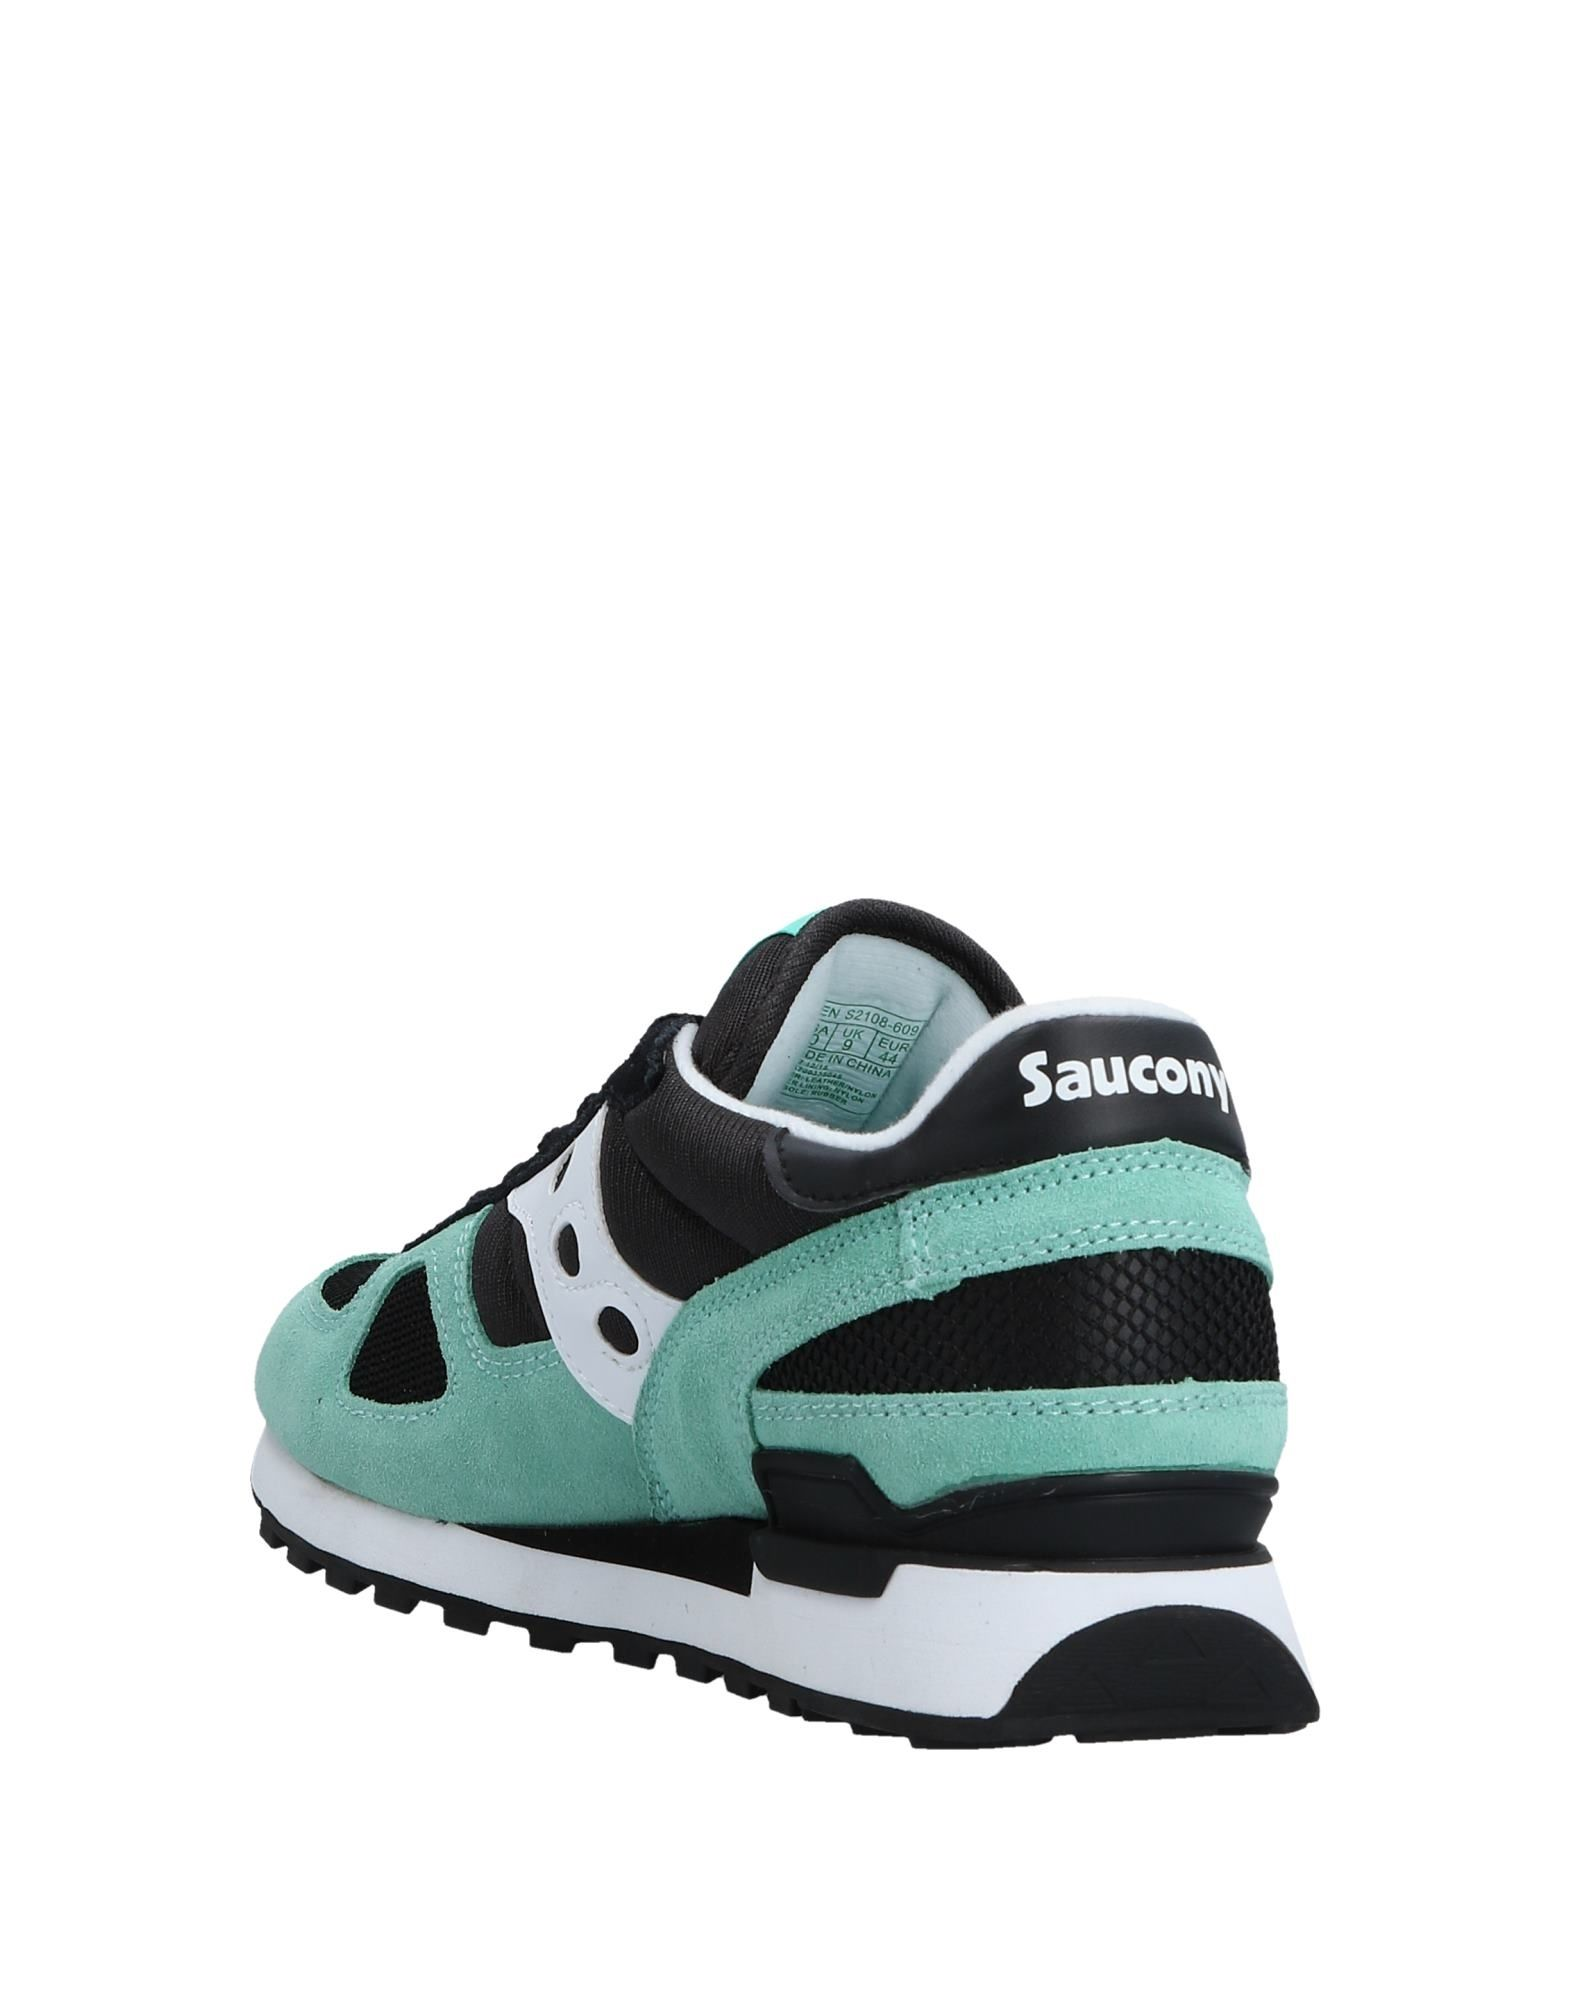 Sneakers Saucony Uomo - elegante 11529966LW elegante - 5d4a8c